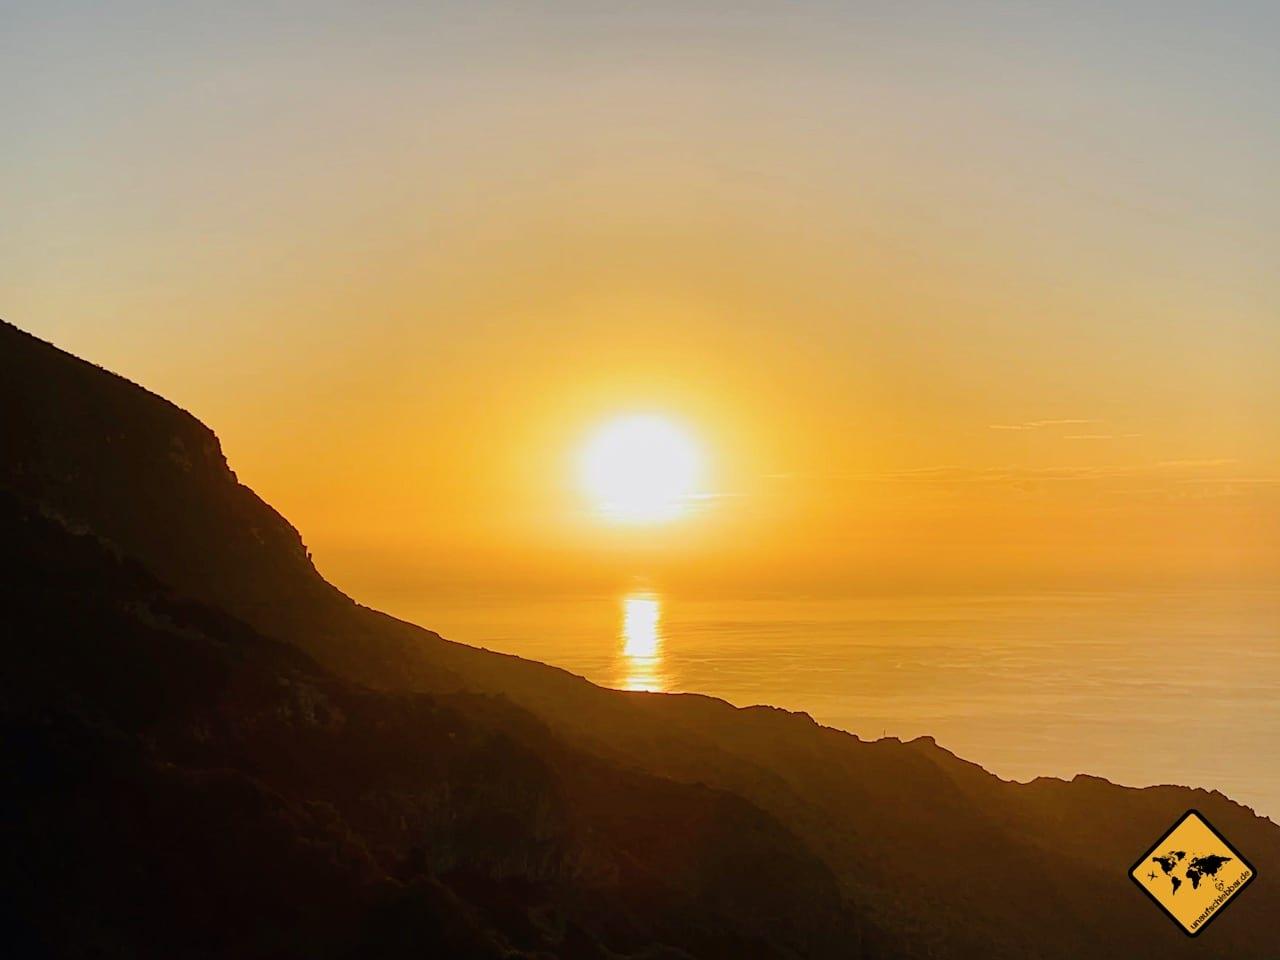 Sonnenuntergang Arguamul